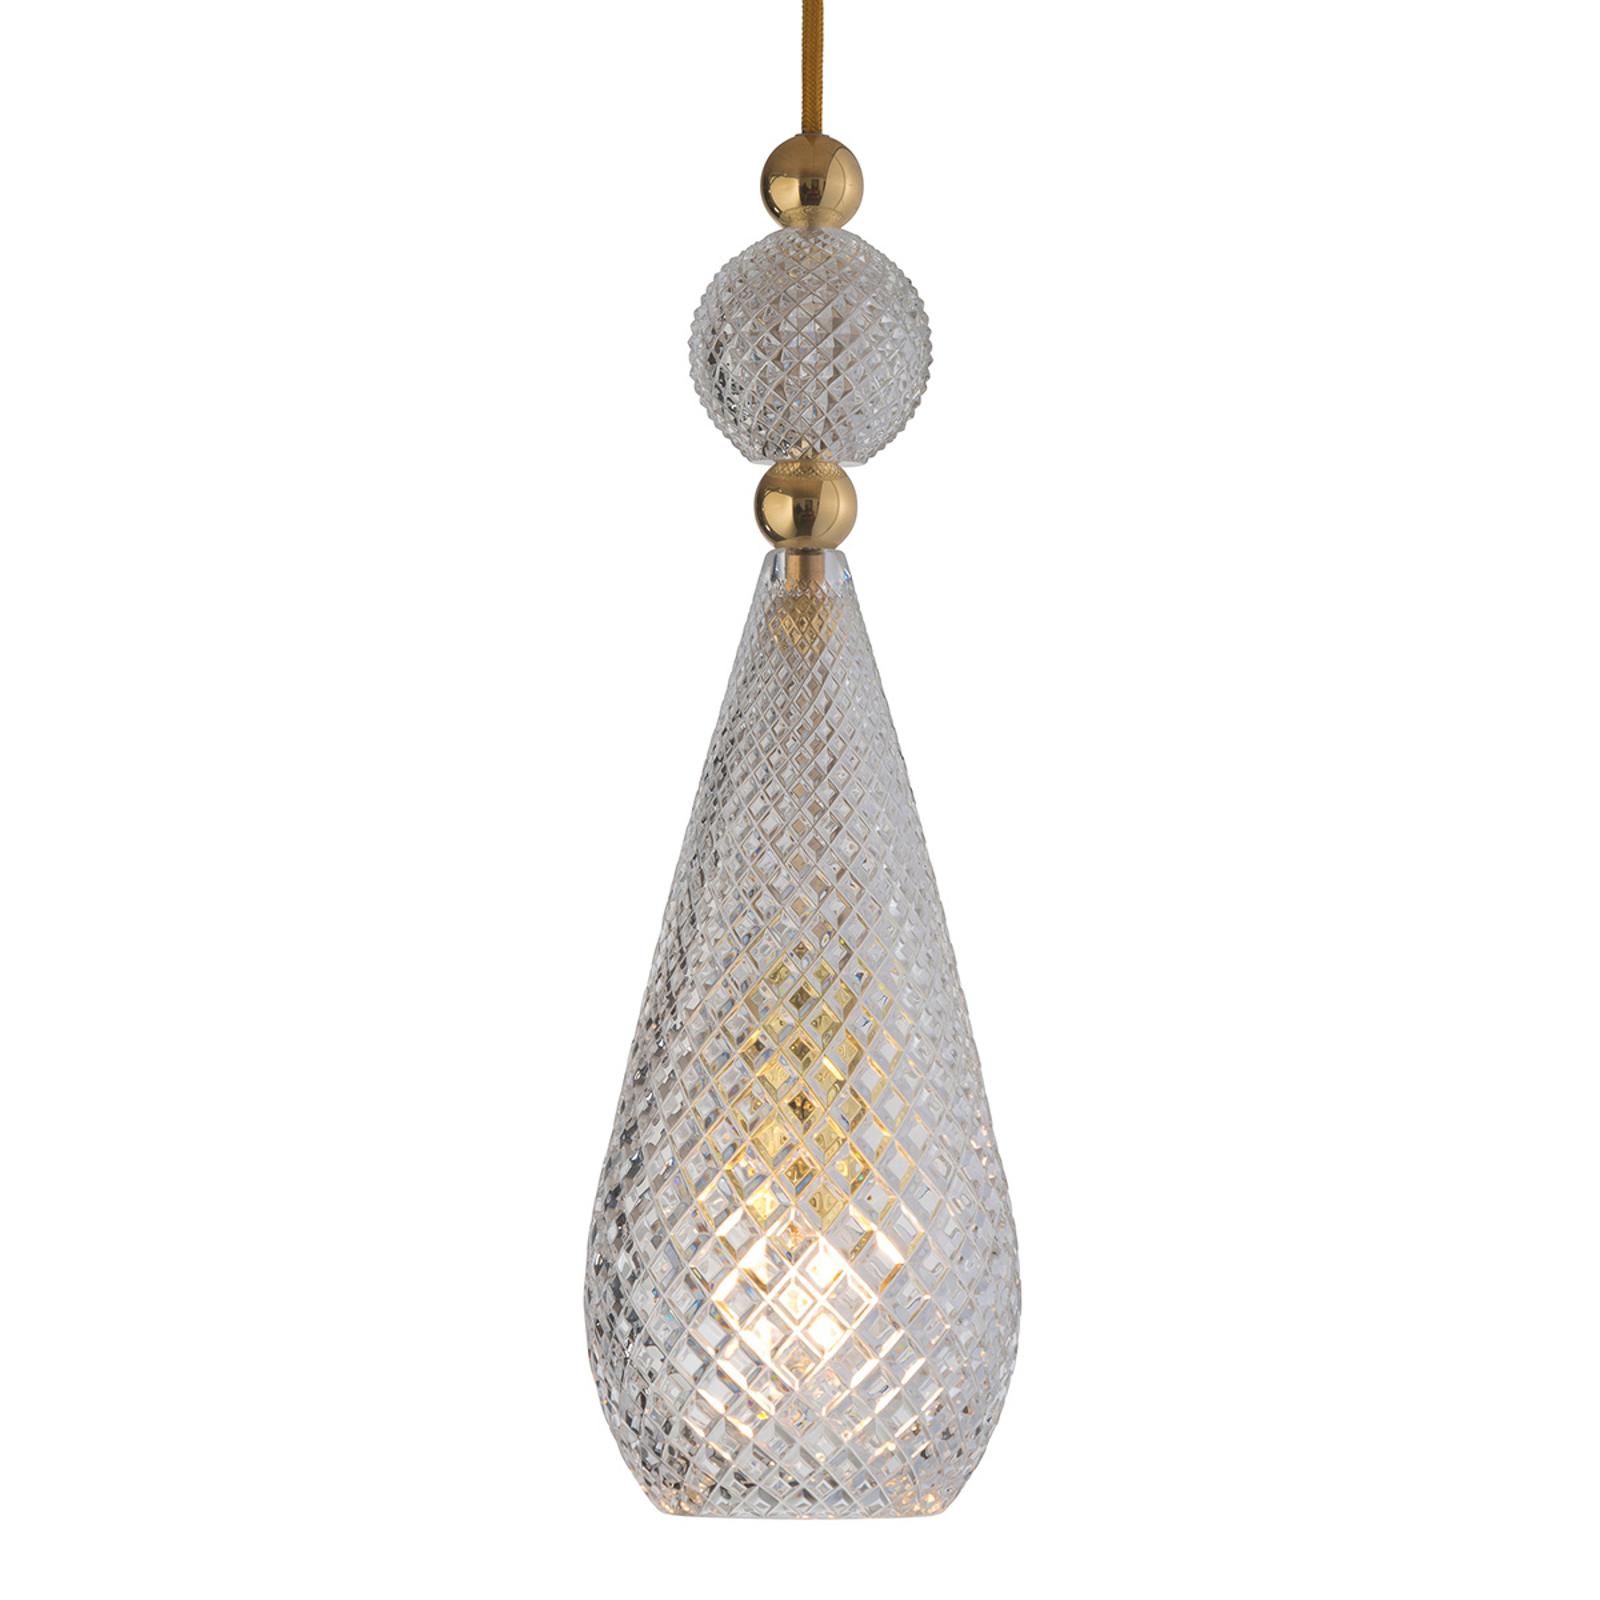 EBB & FLOW Smykke hanglamp goud, kristal